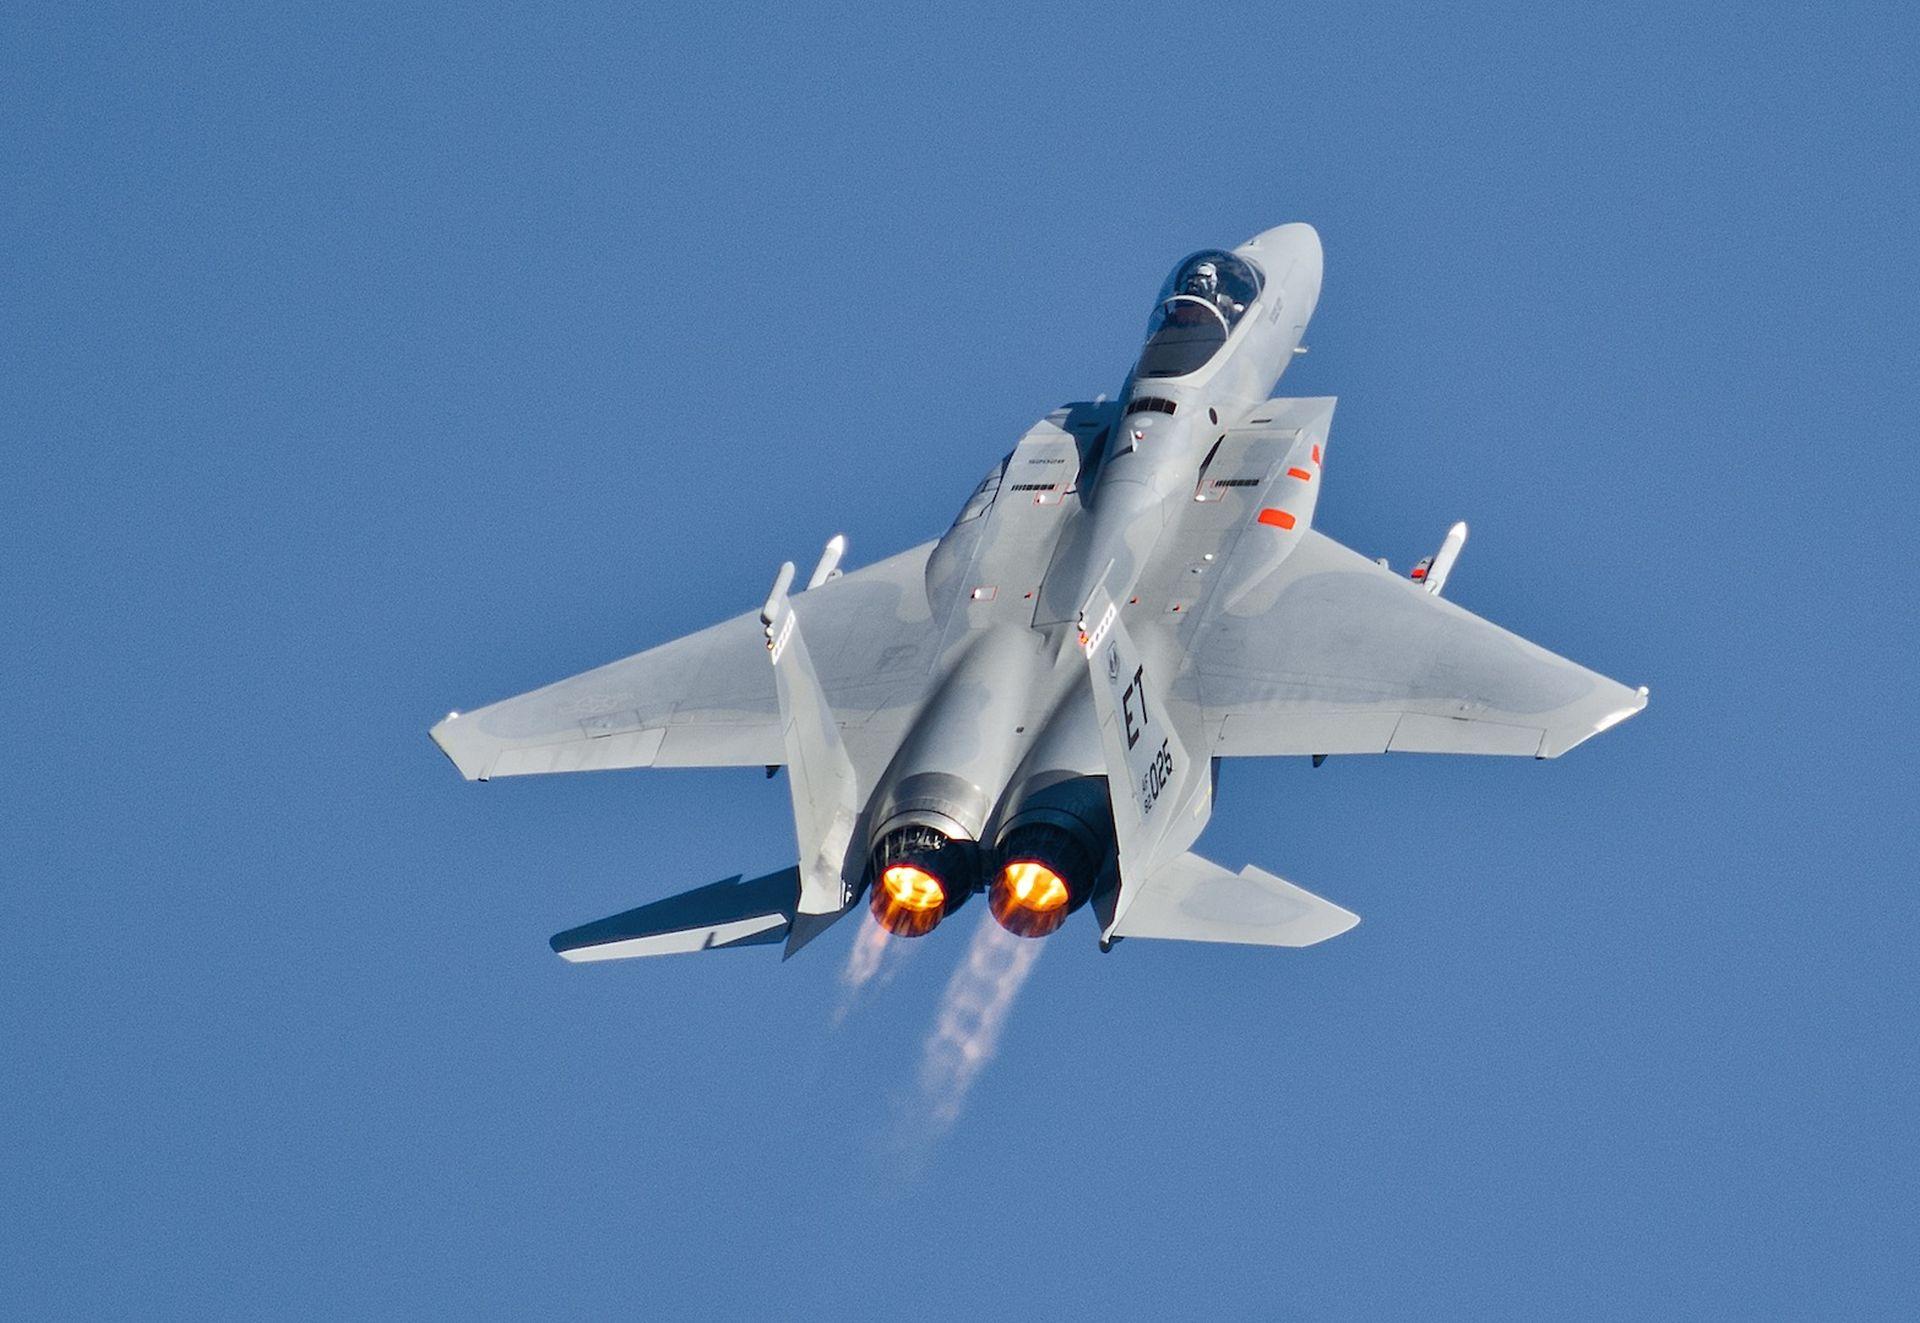 U.S. F-15C Crashed Off Coast Of England, Pilot's Body Discovered